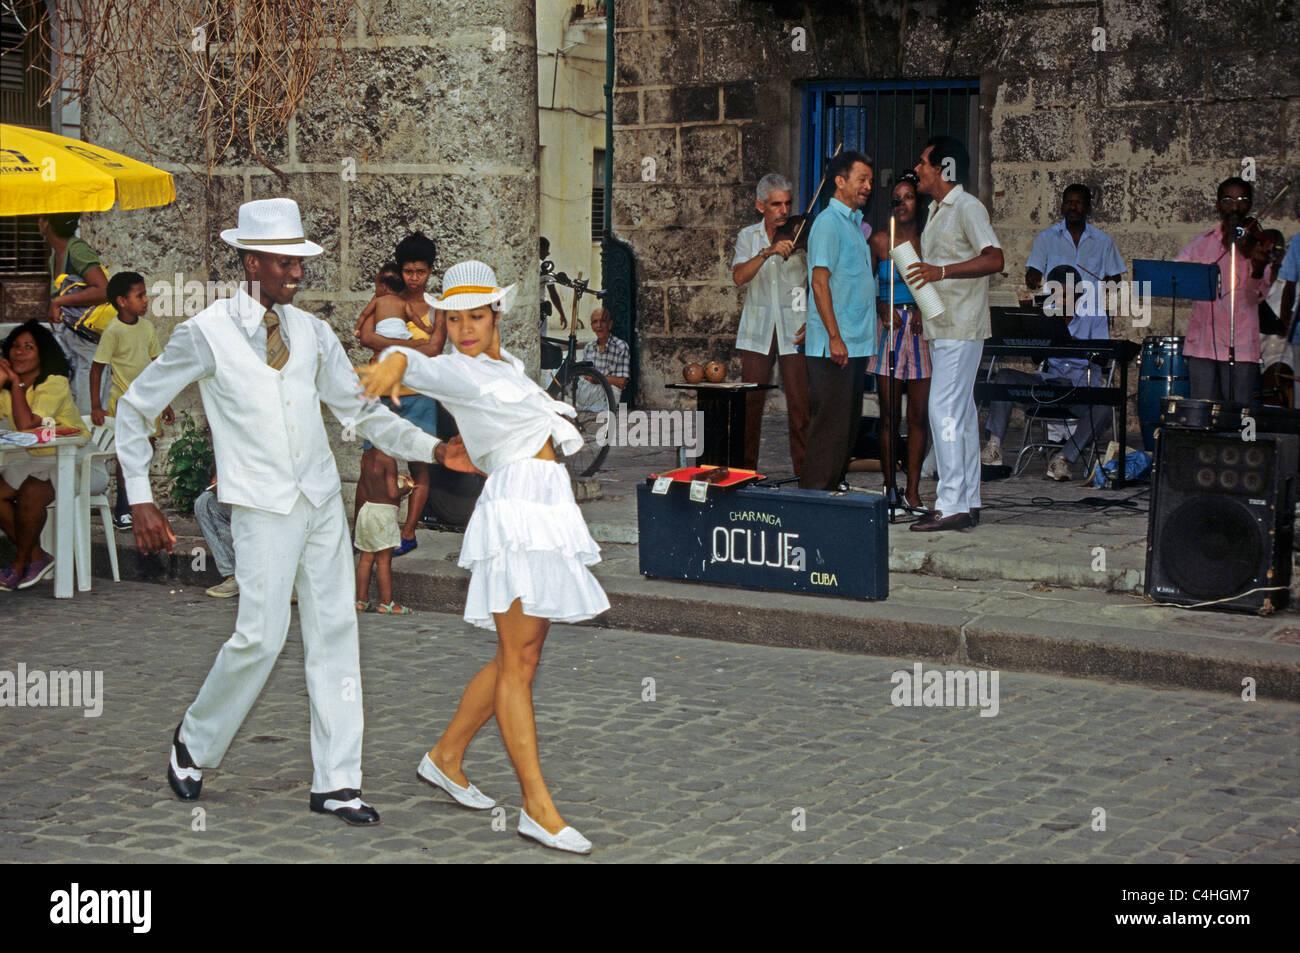 Kubanisches Tanzendes Paar, Plaza De La Catedral Havanna, Kuba, Karibi, kubanische Tanz paar Habana Cuba Stockbild